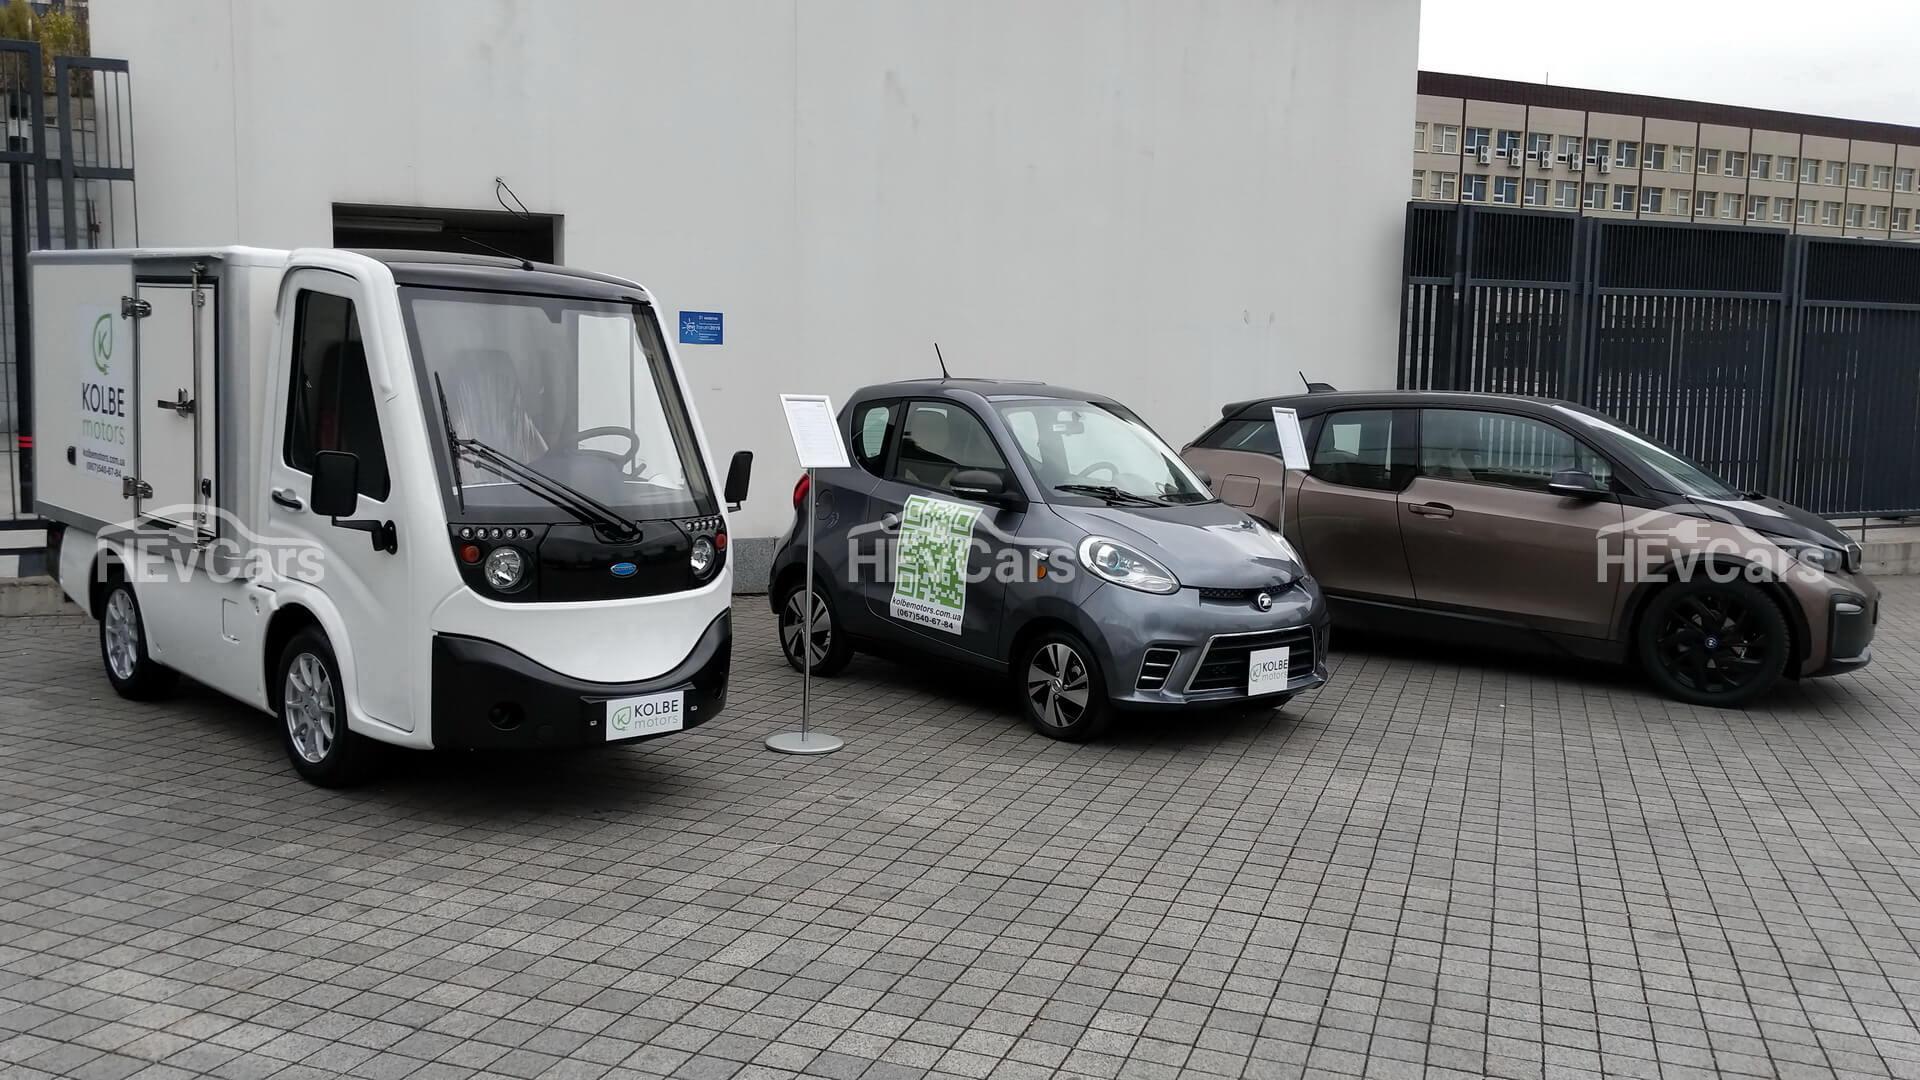 Двухместный электромобиль ZhiDou D2, электрофургон Cenntro Metro и BMW i3